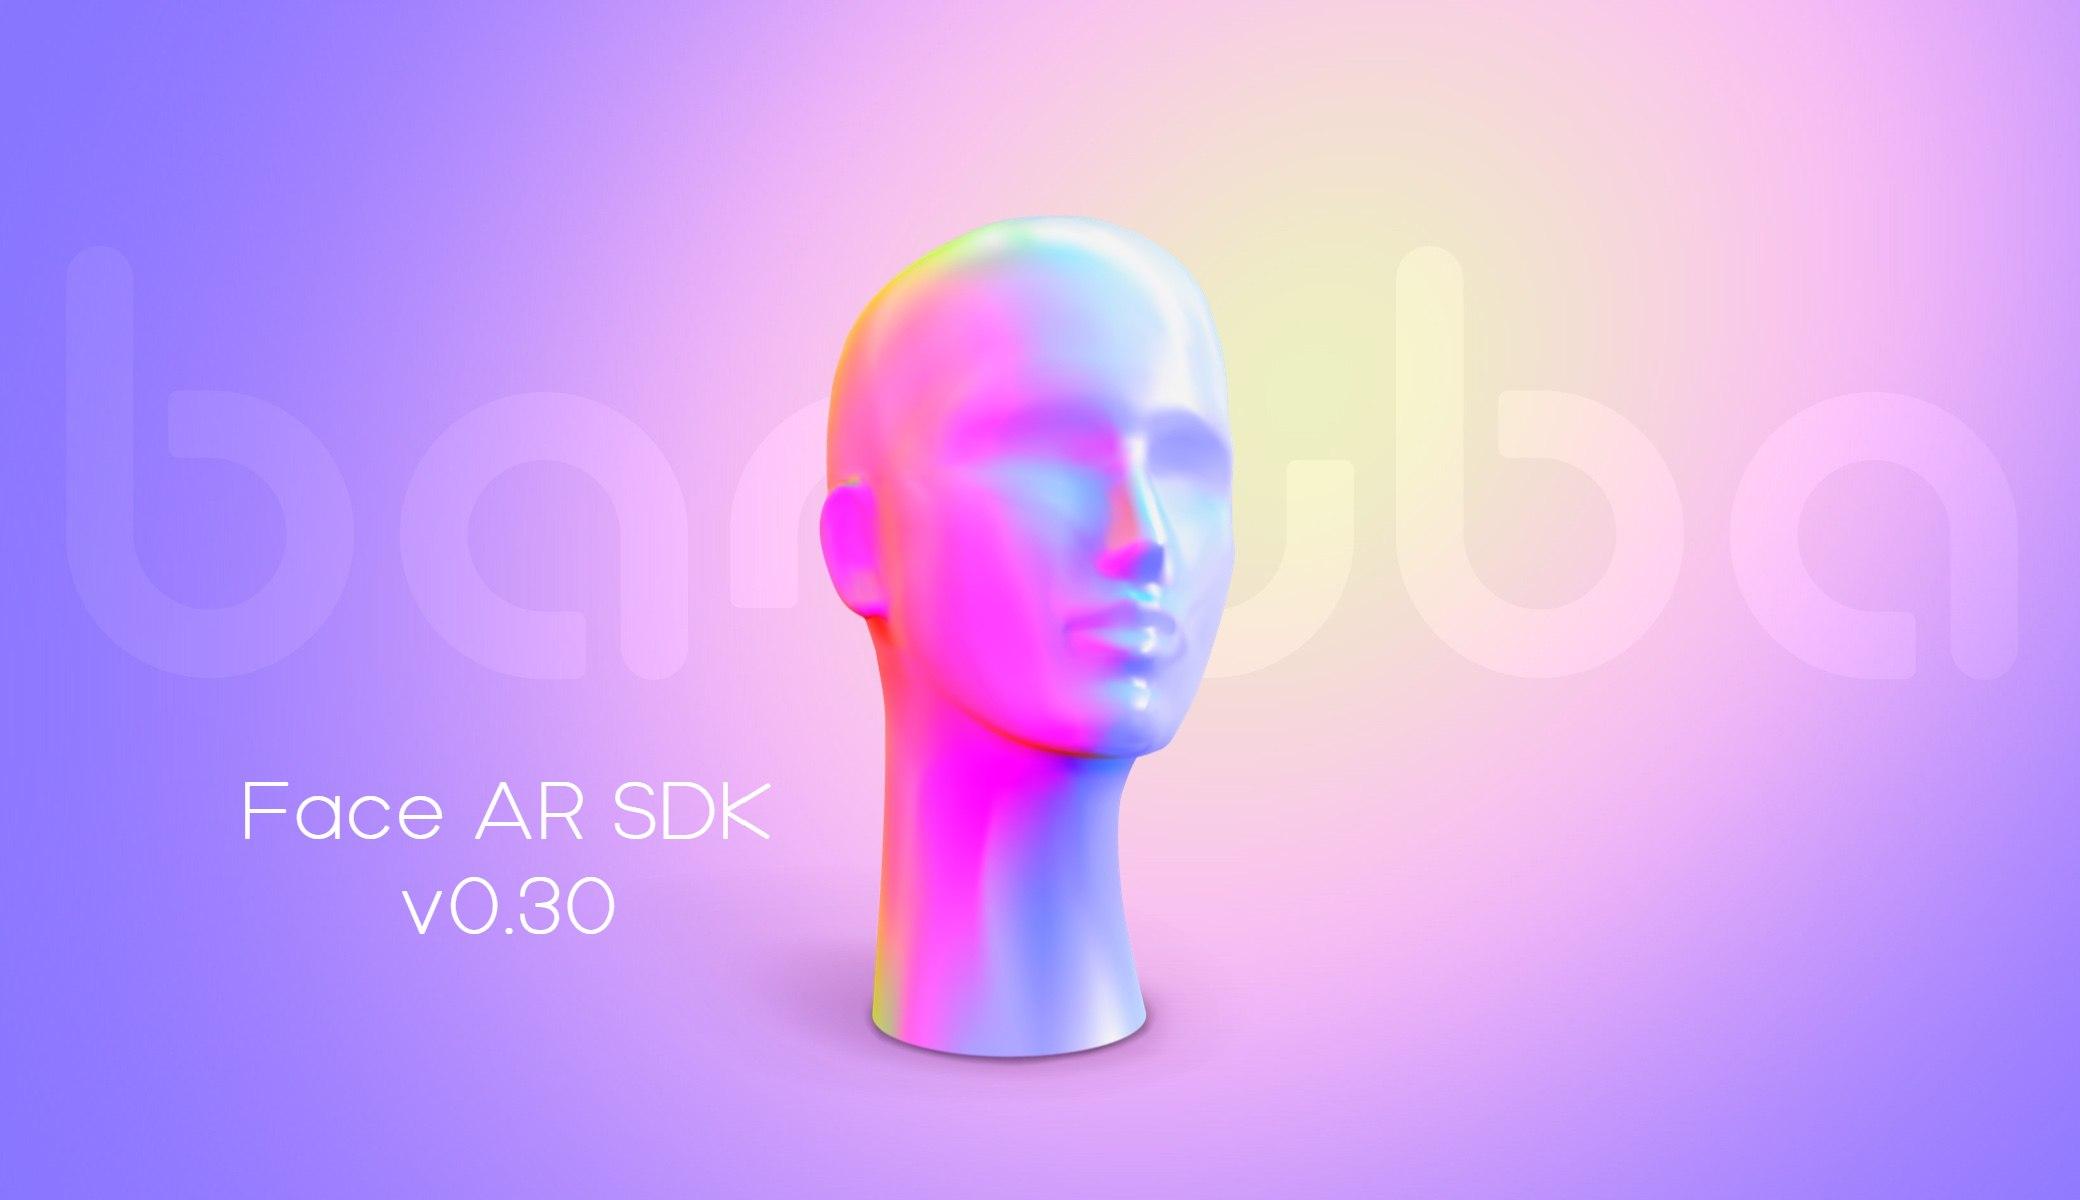 face ar sdk v0.30 release notes